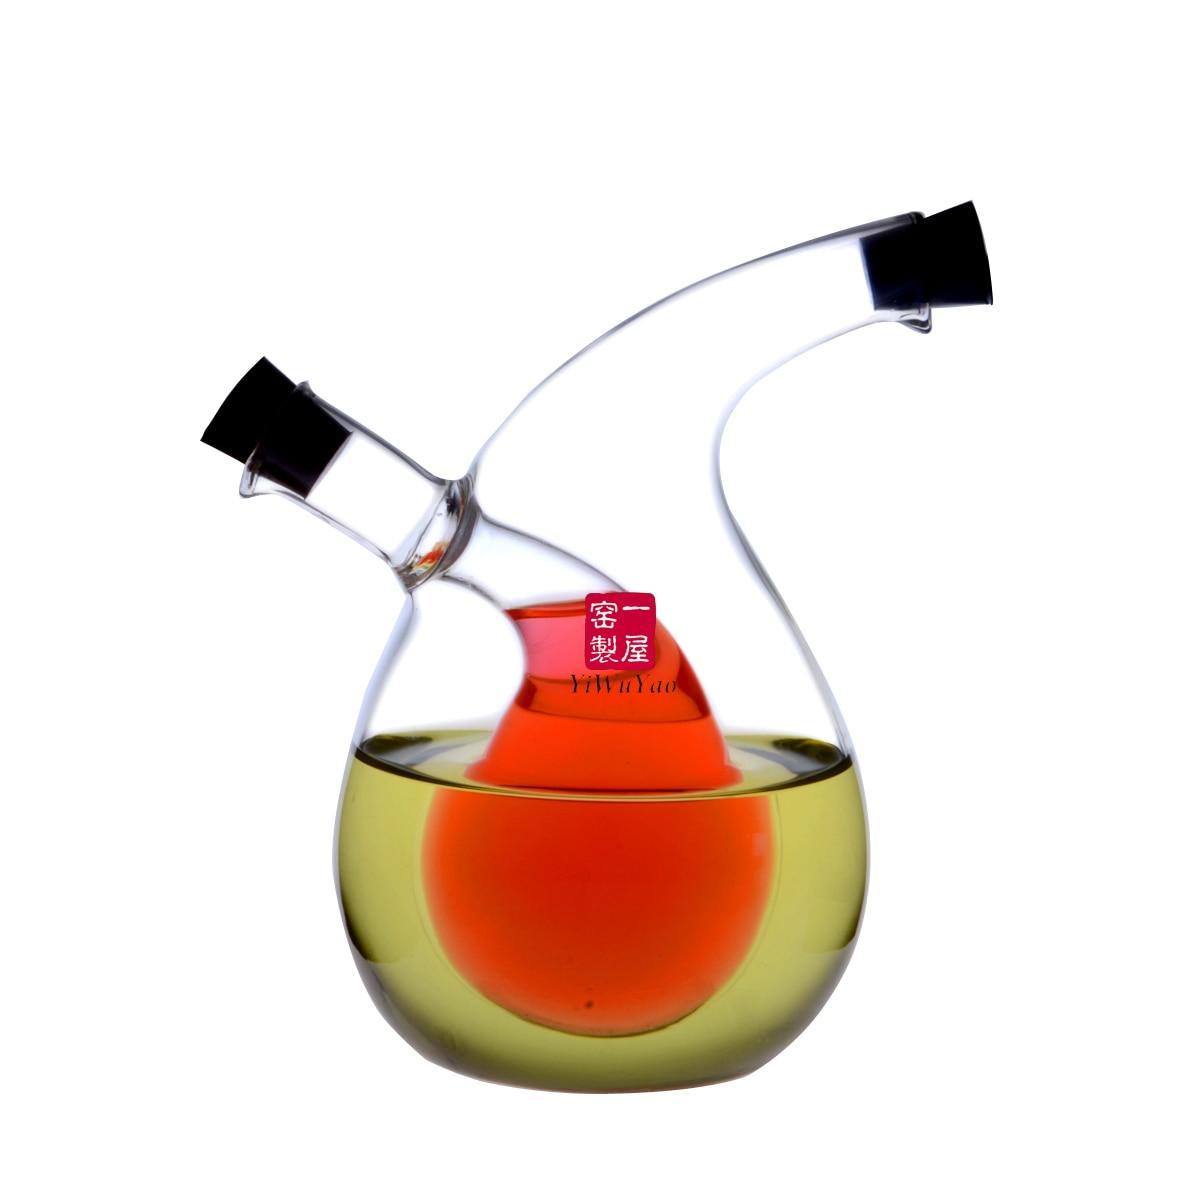 creative kitchen supplies oil and vinegar bottle oiler. Black Bedroom Furniture Sets. Home Design Ideas